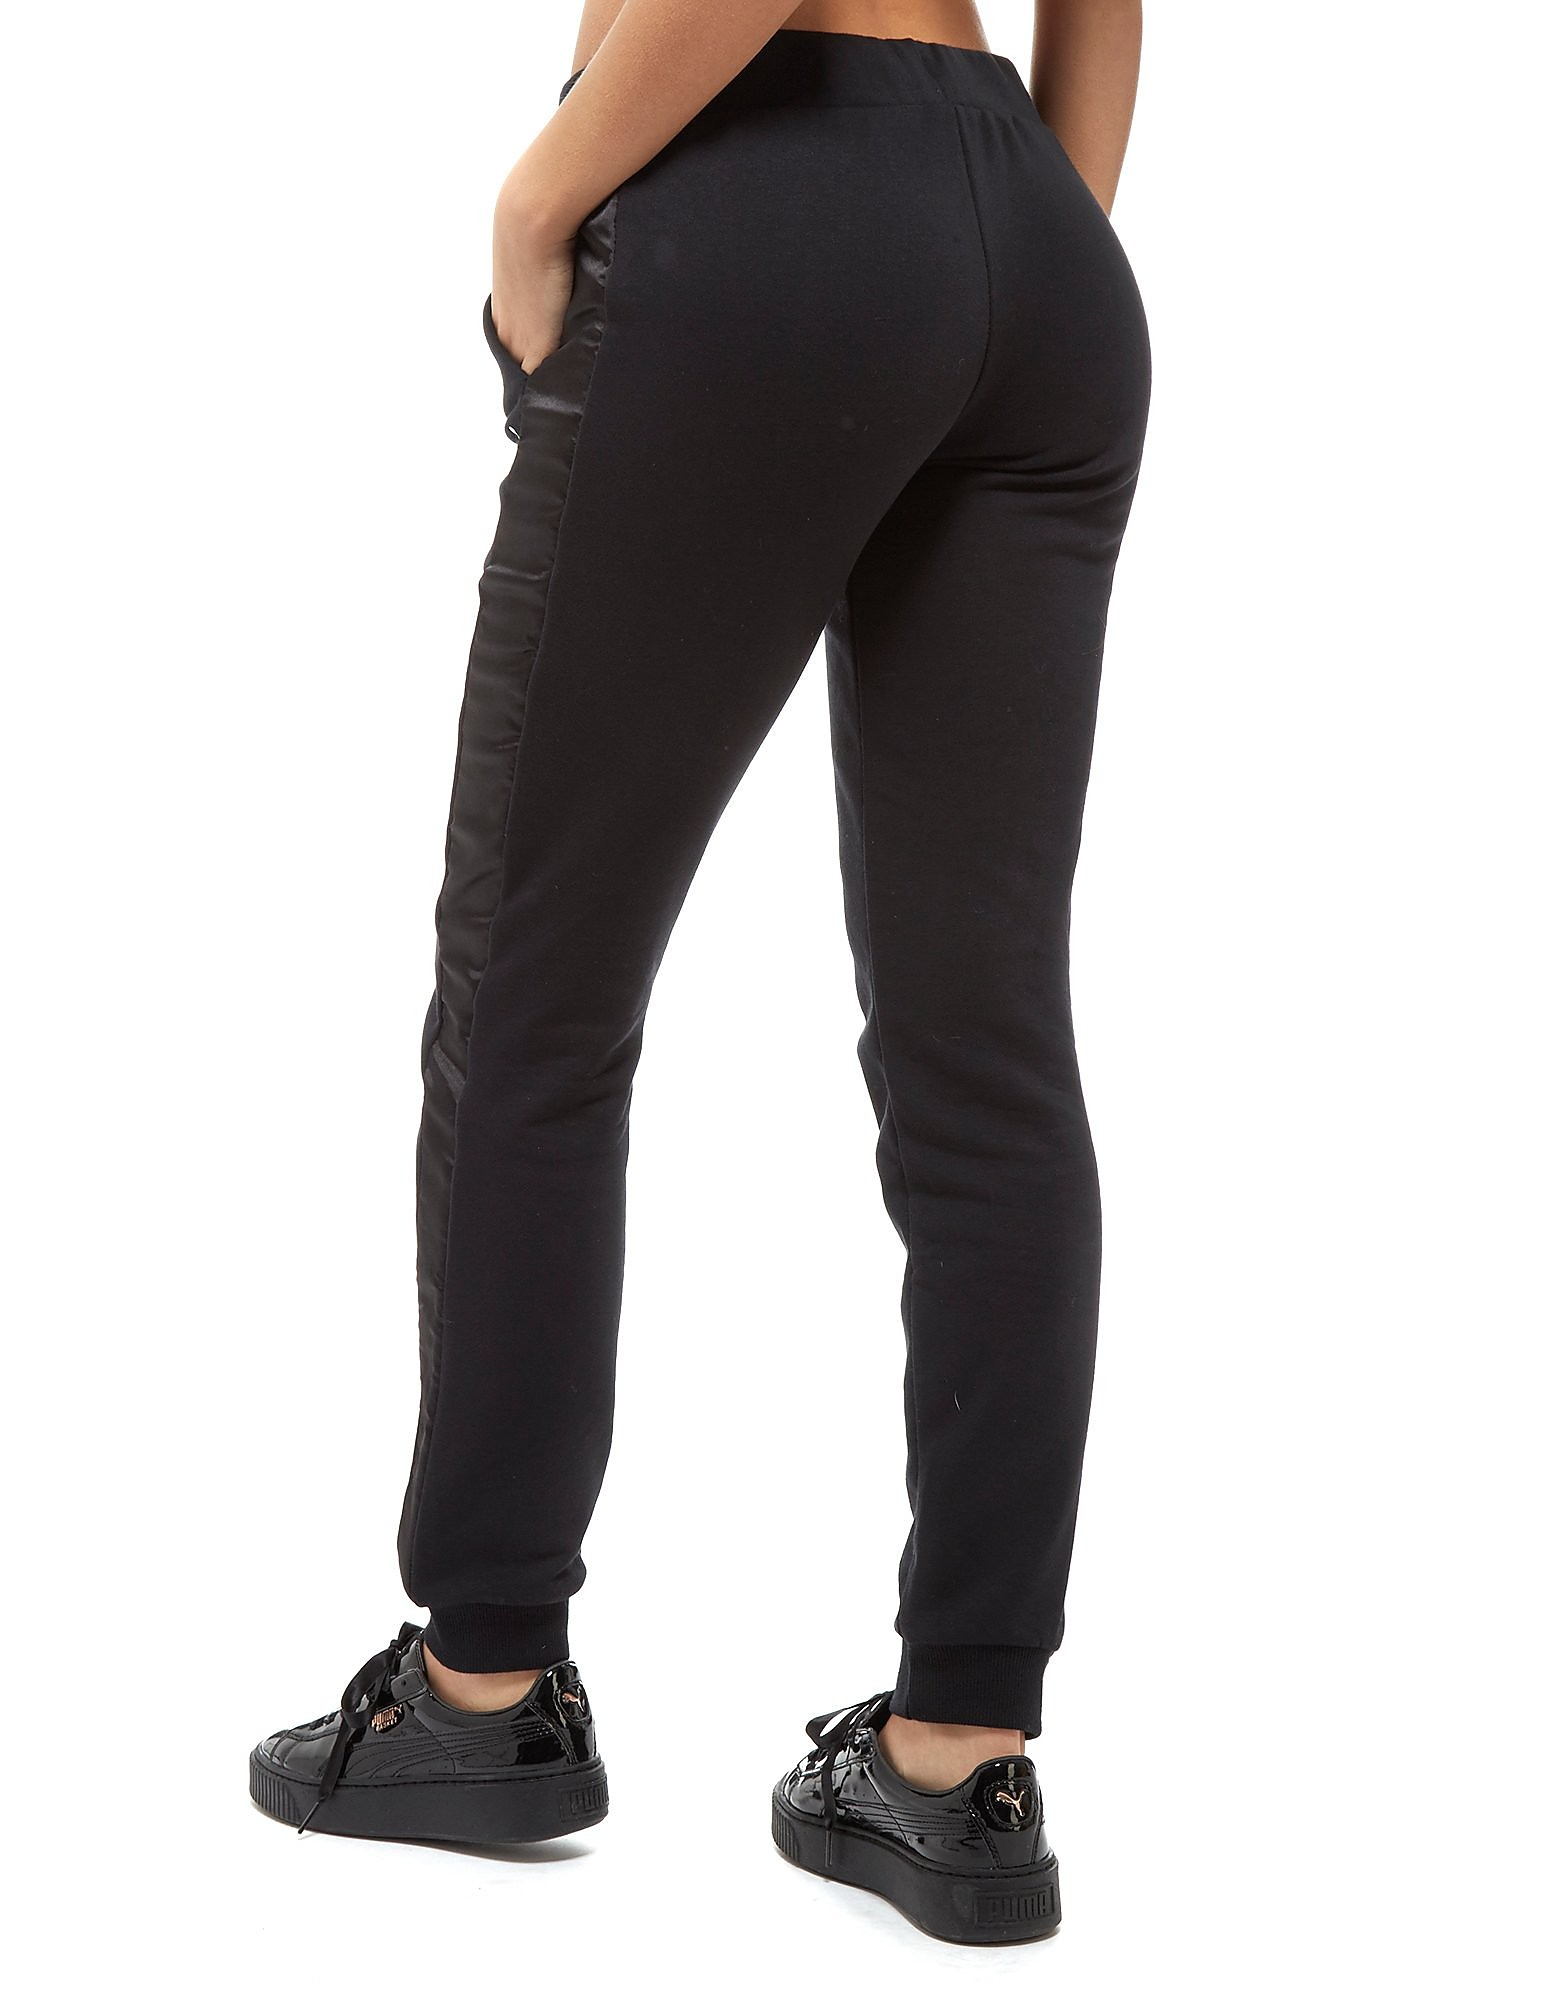 PUMA Bow Fleece Pantaloni Donna